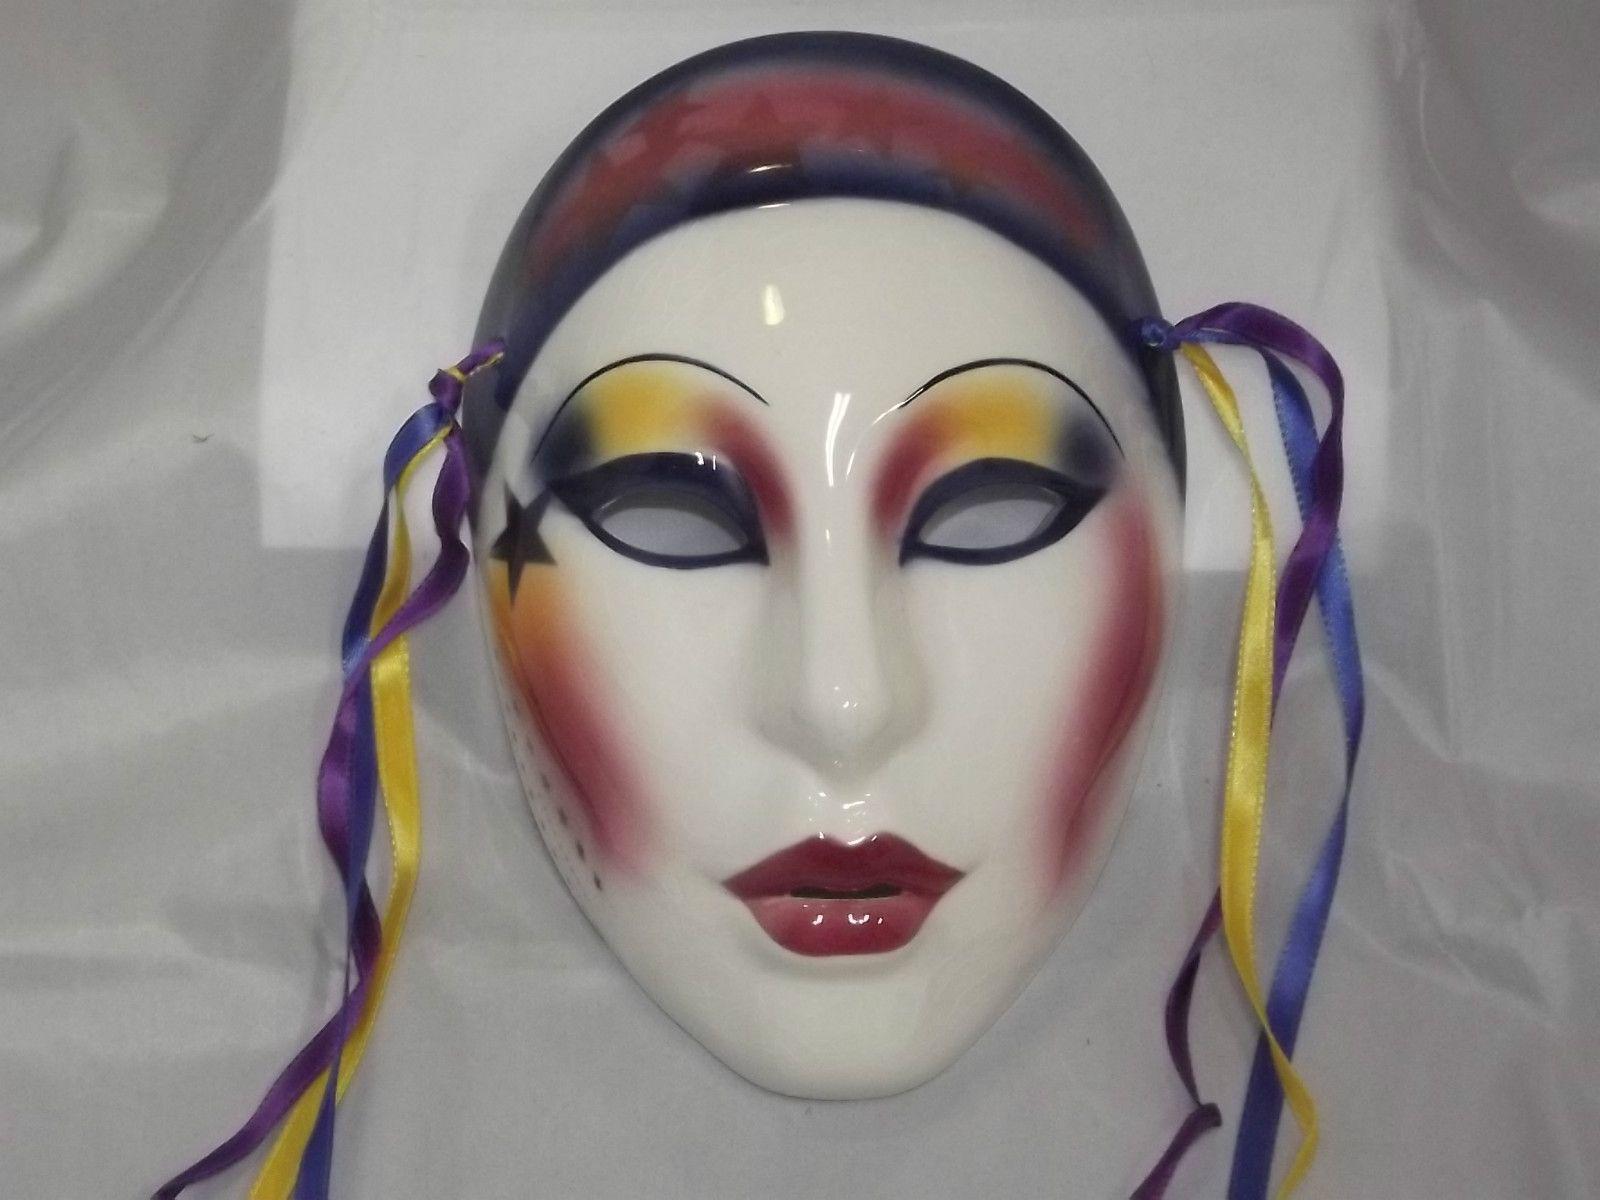 Clay art Mask San Francisco Co. Haleys Comet Masks